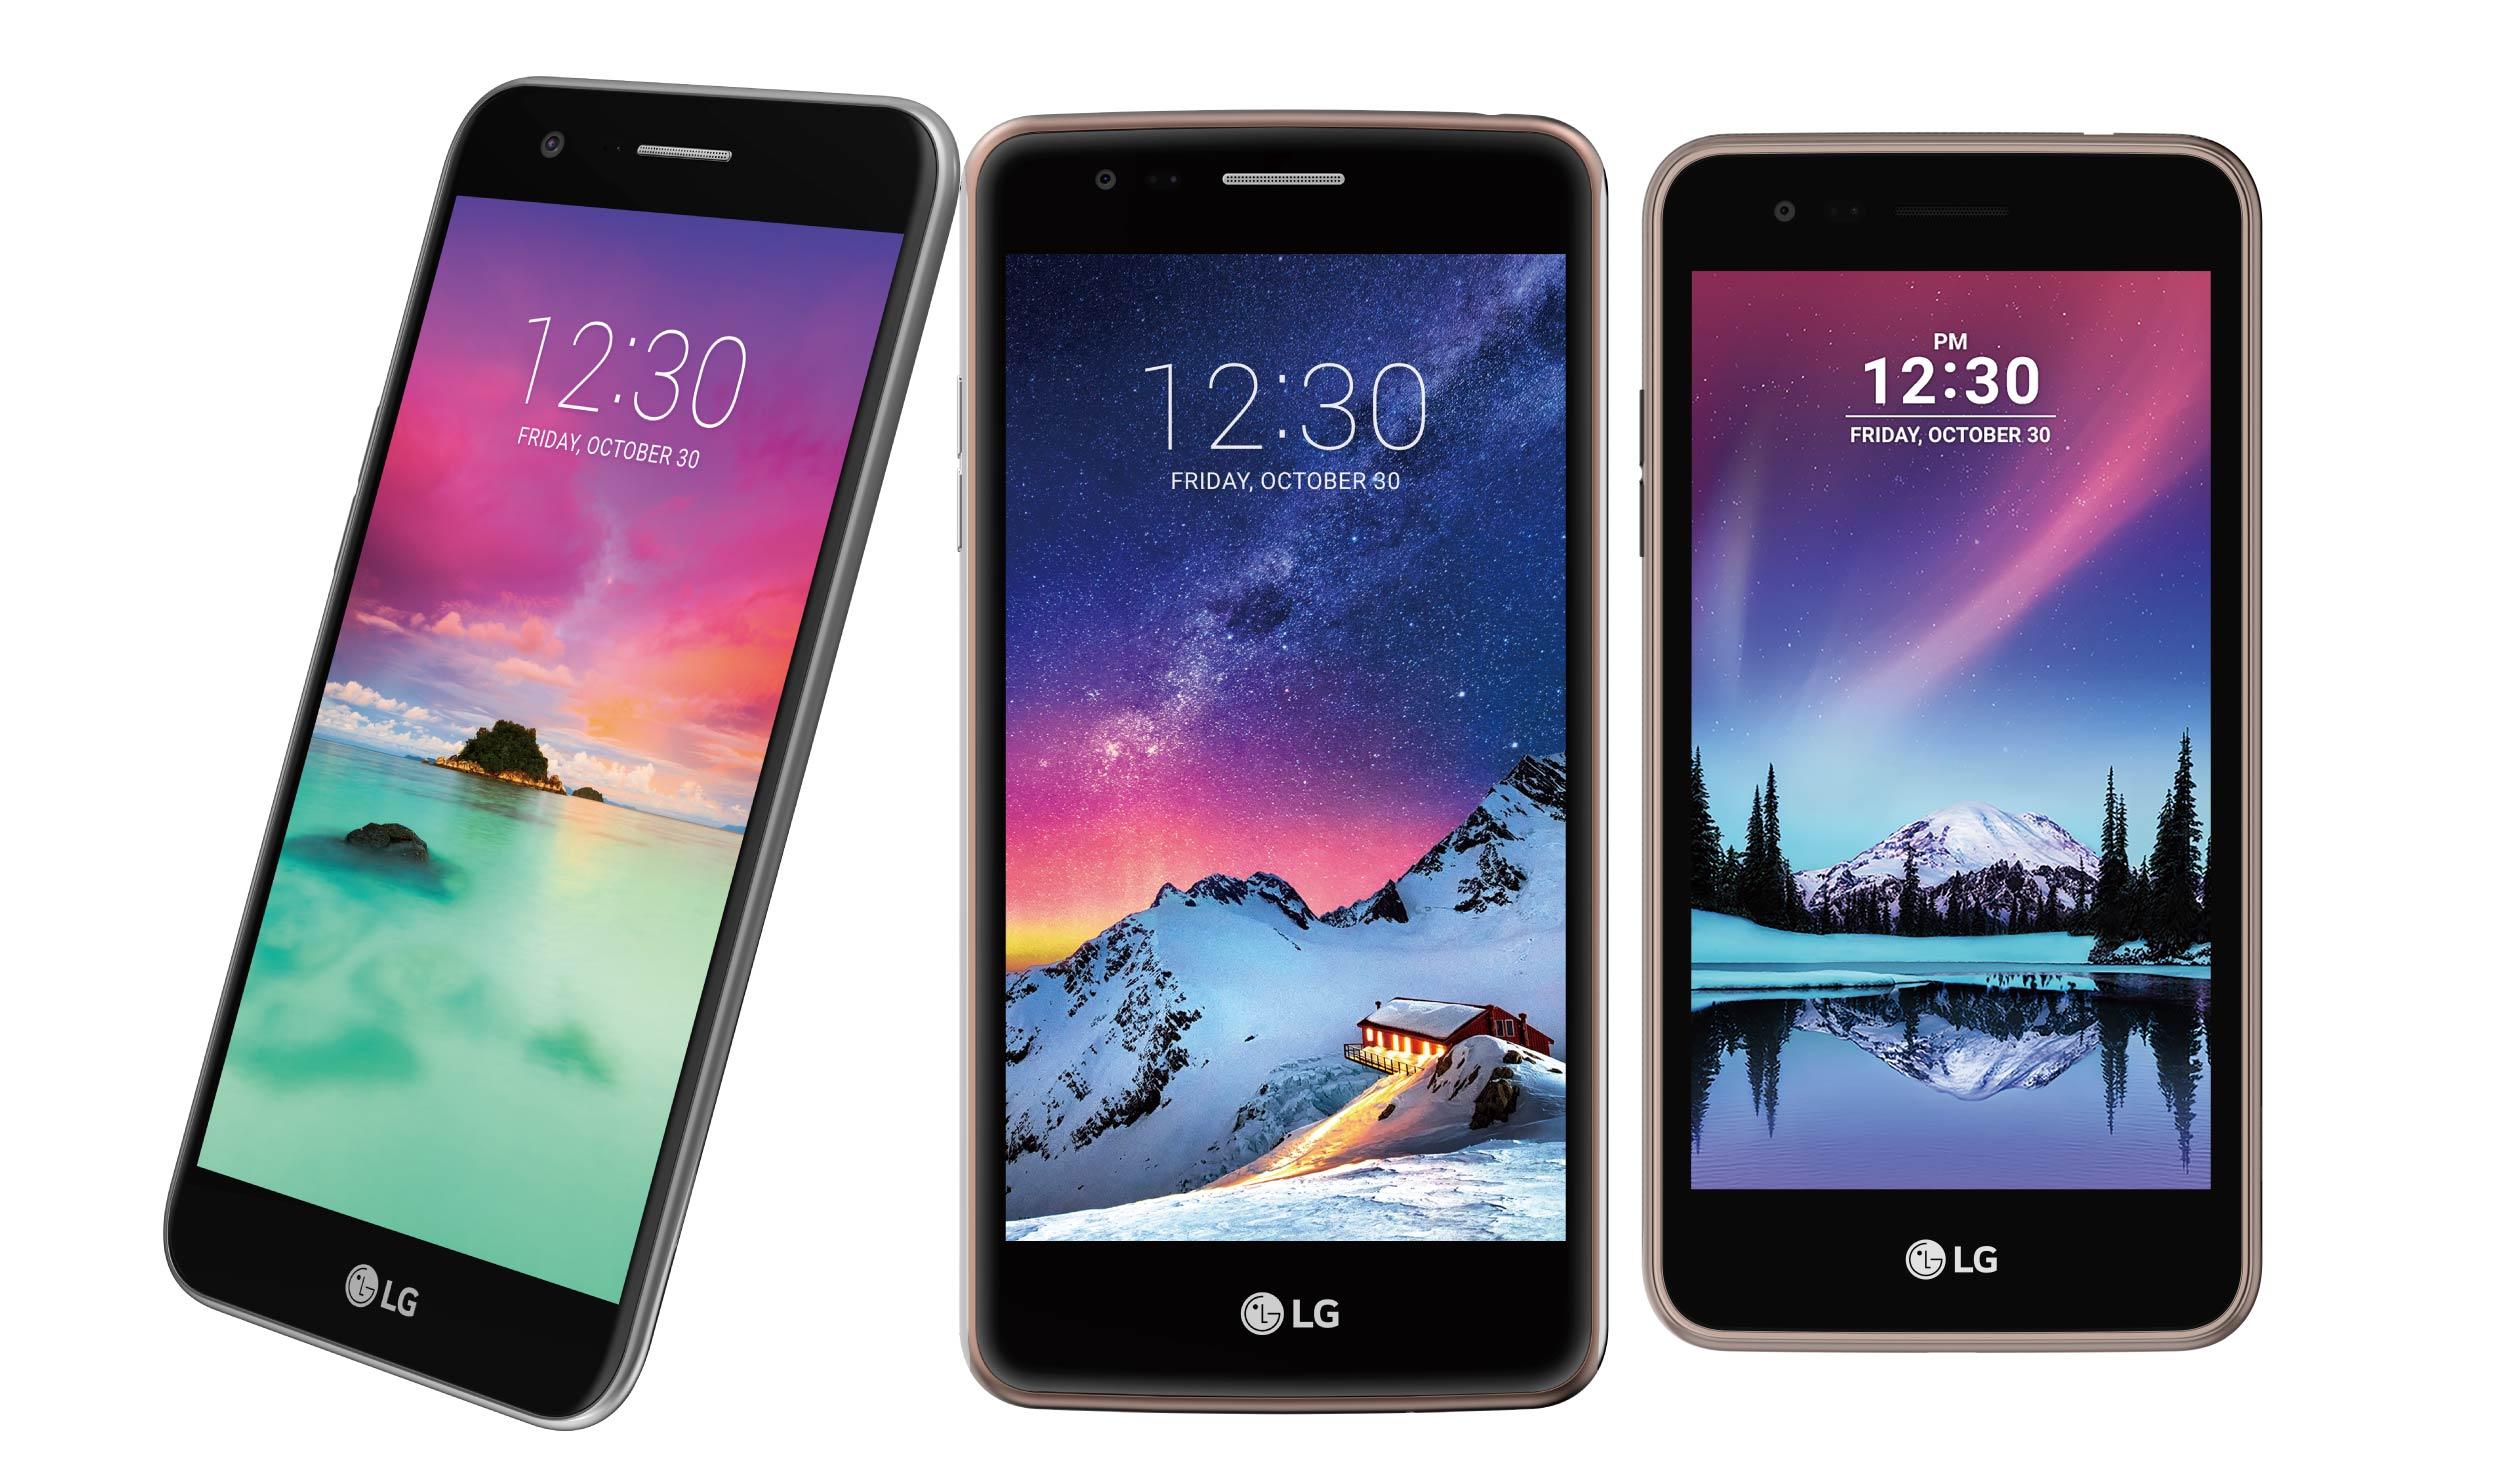 LG K SERIES及Stylus 3新機上市!玩轉生活樂趣 K SERIES 2017攜手掰掰啾啾,輕鬆玩更出「攝」!Stylus 3 1.8mm手寫「筆」較犀利,5.7吋超大「螢」家!